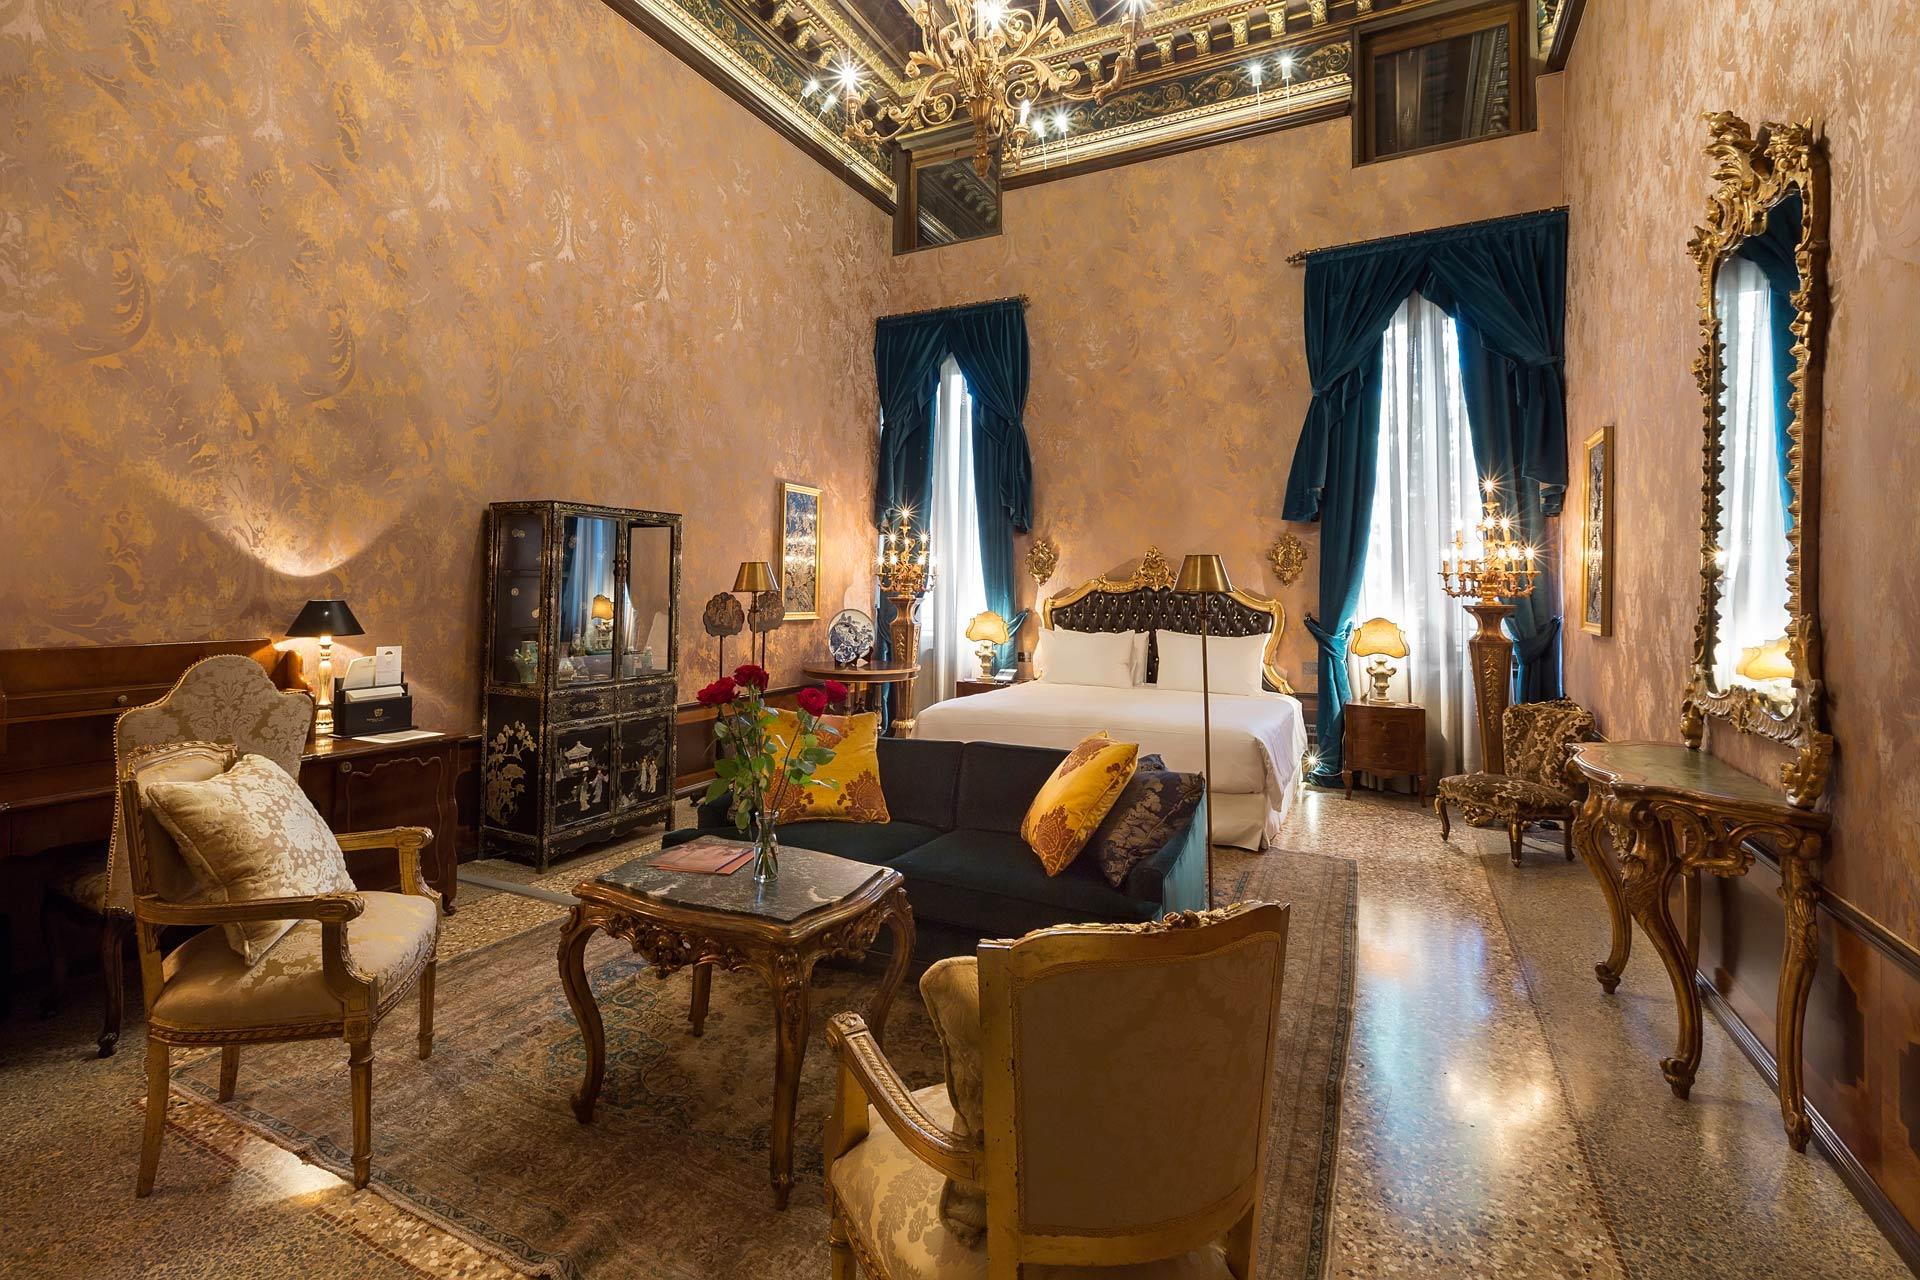 Palazzo-Venart-in-Venice-Luxury-room